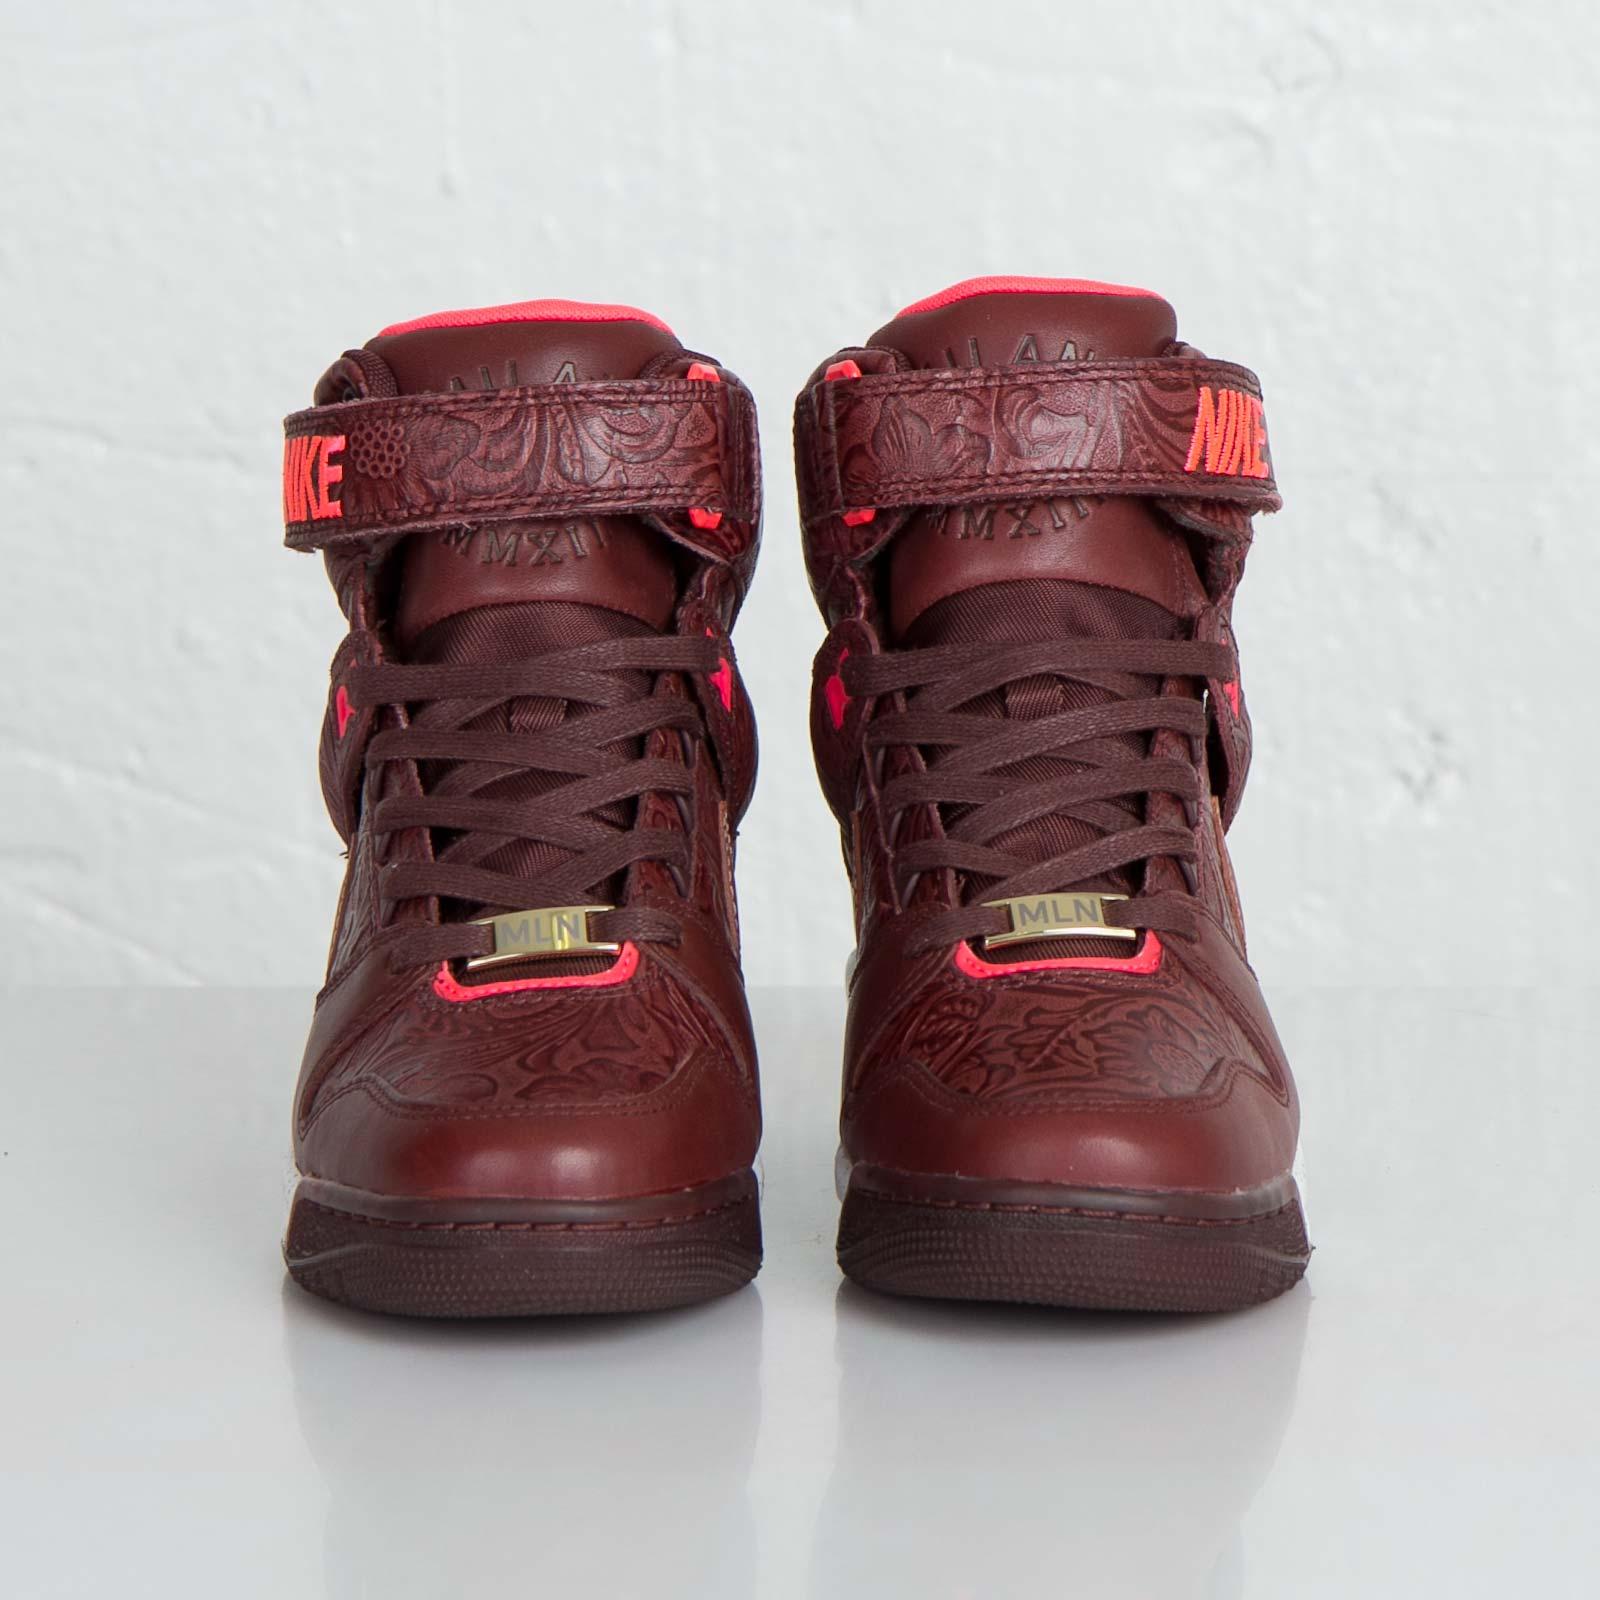 newest bdb59 fbff9 Nike W Air Revolution Sky Hi FW QS - 633525-200 - Sneakersnstuff | sneakers  & streetwear online since 1999